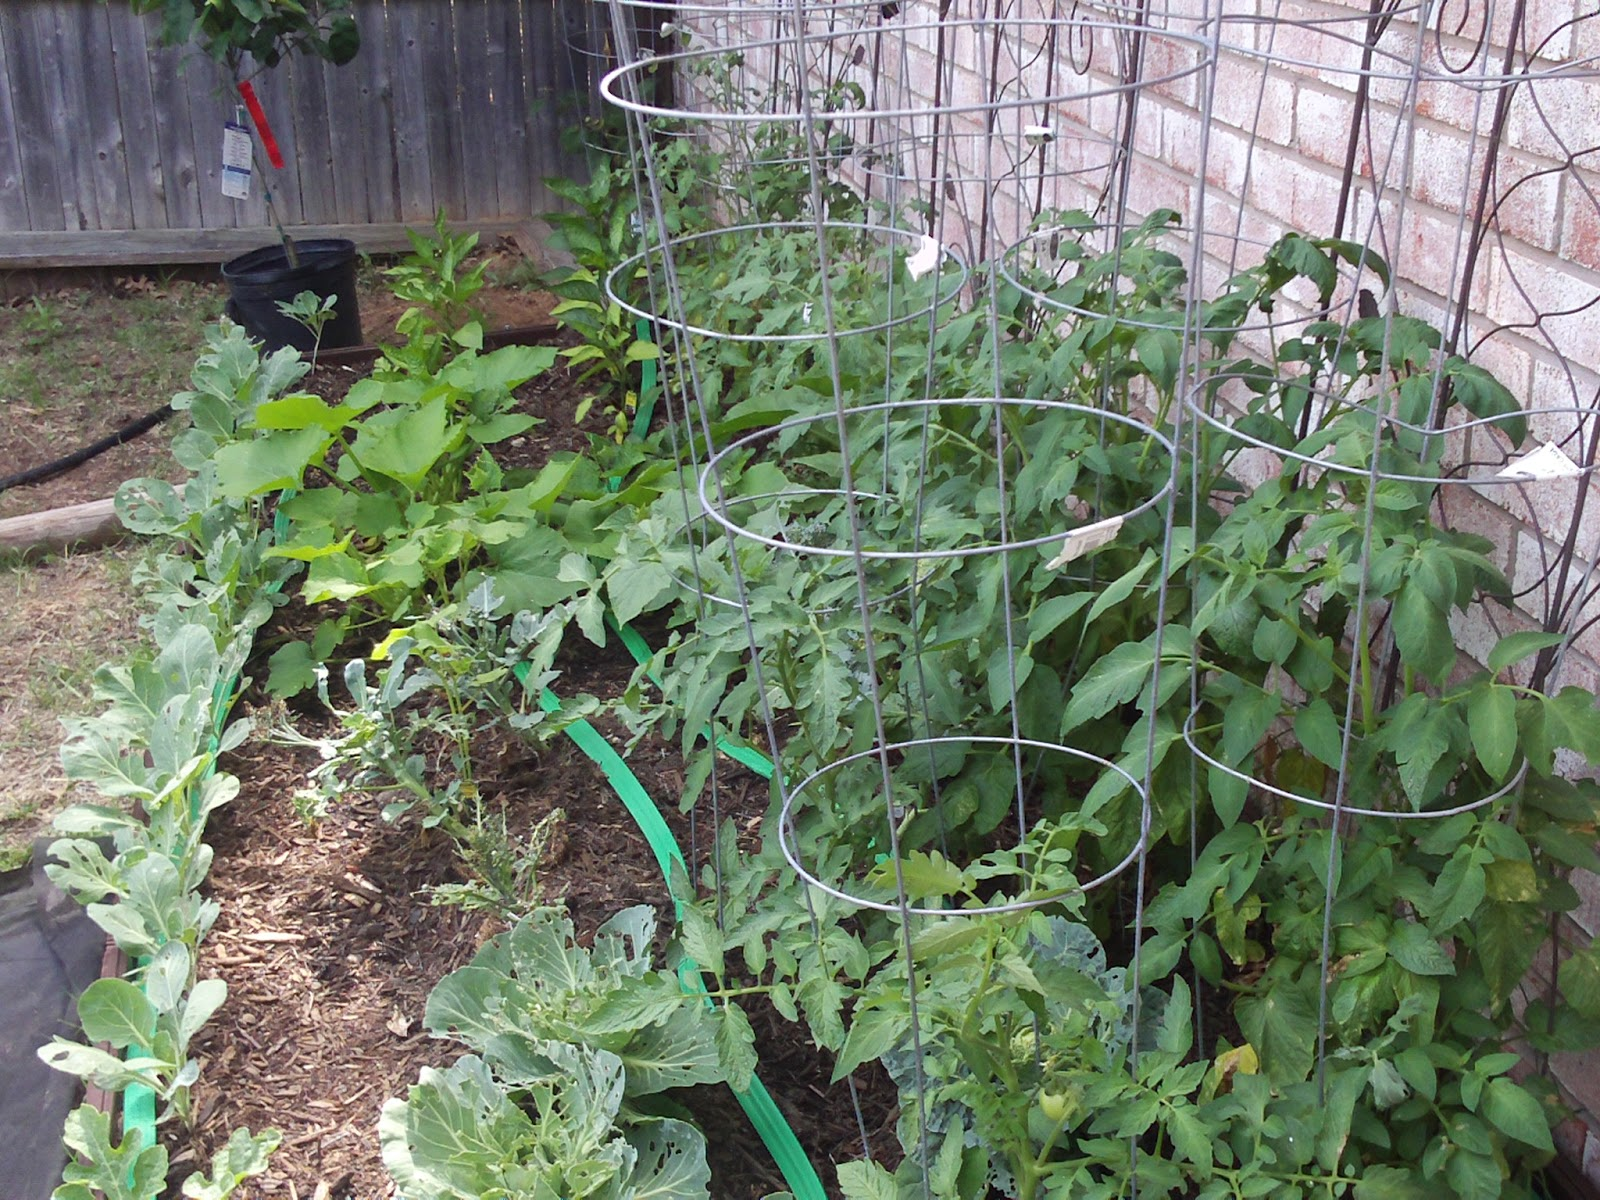 Dr jennifer t edwards texas author researcher and - Olive garden miller lane dayton ohio ...